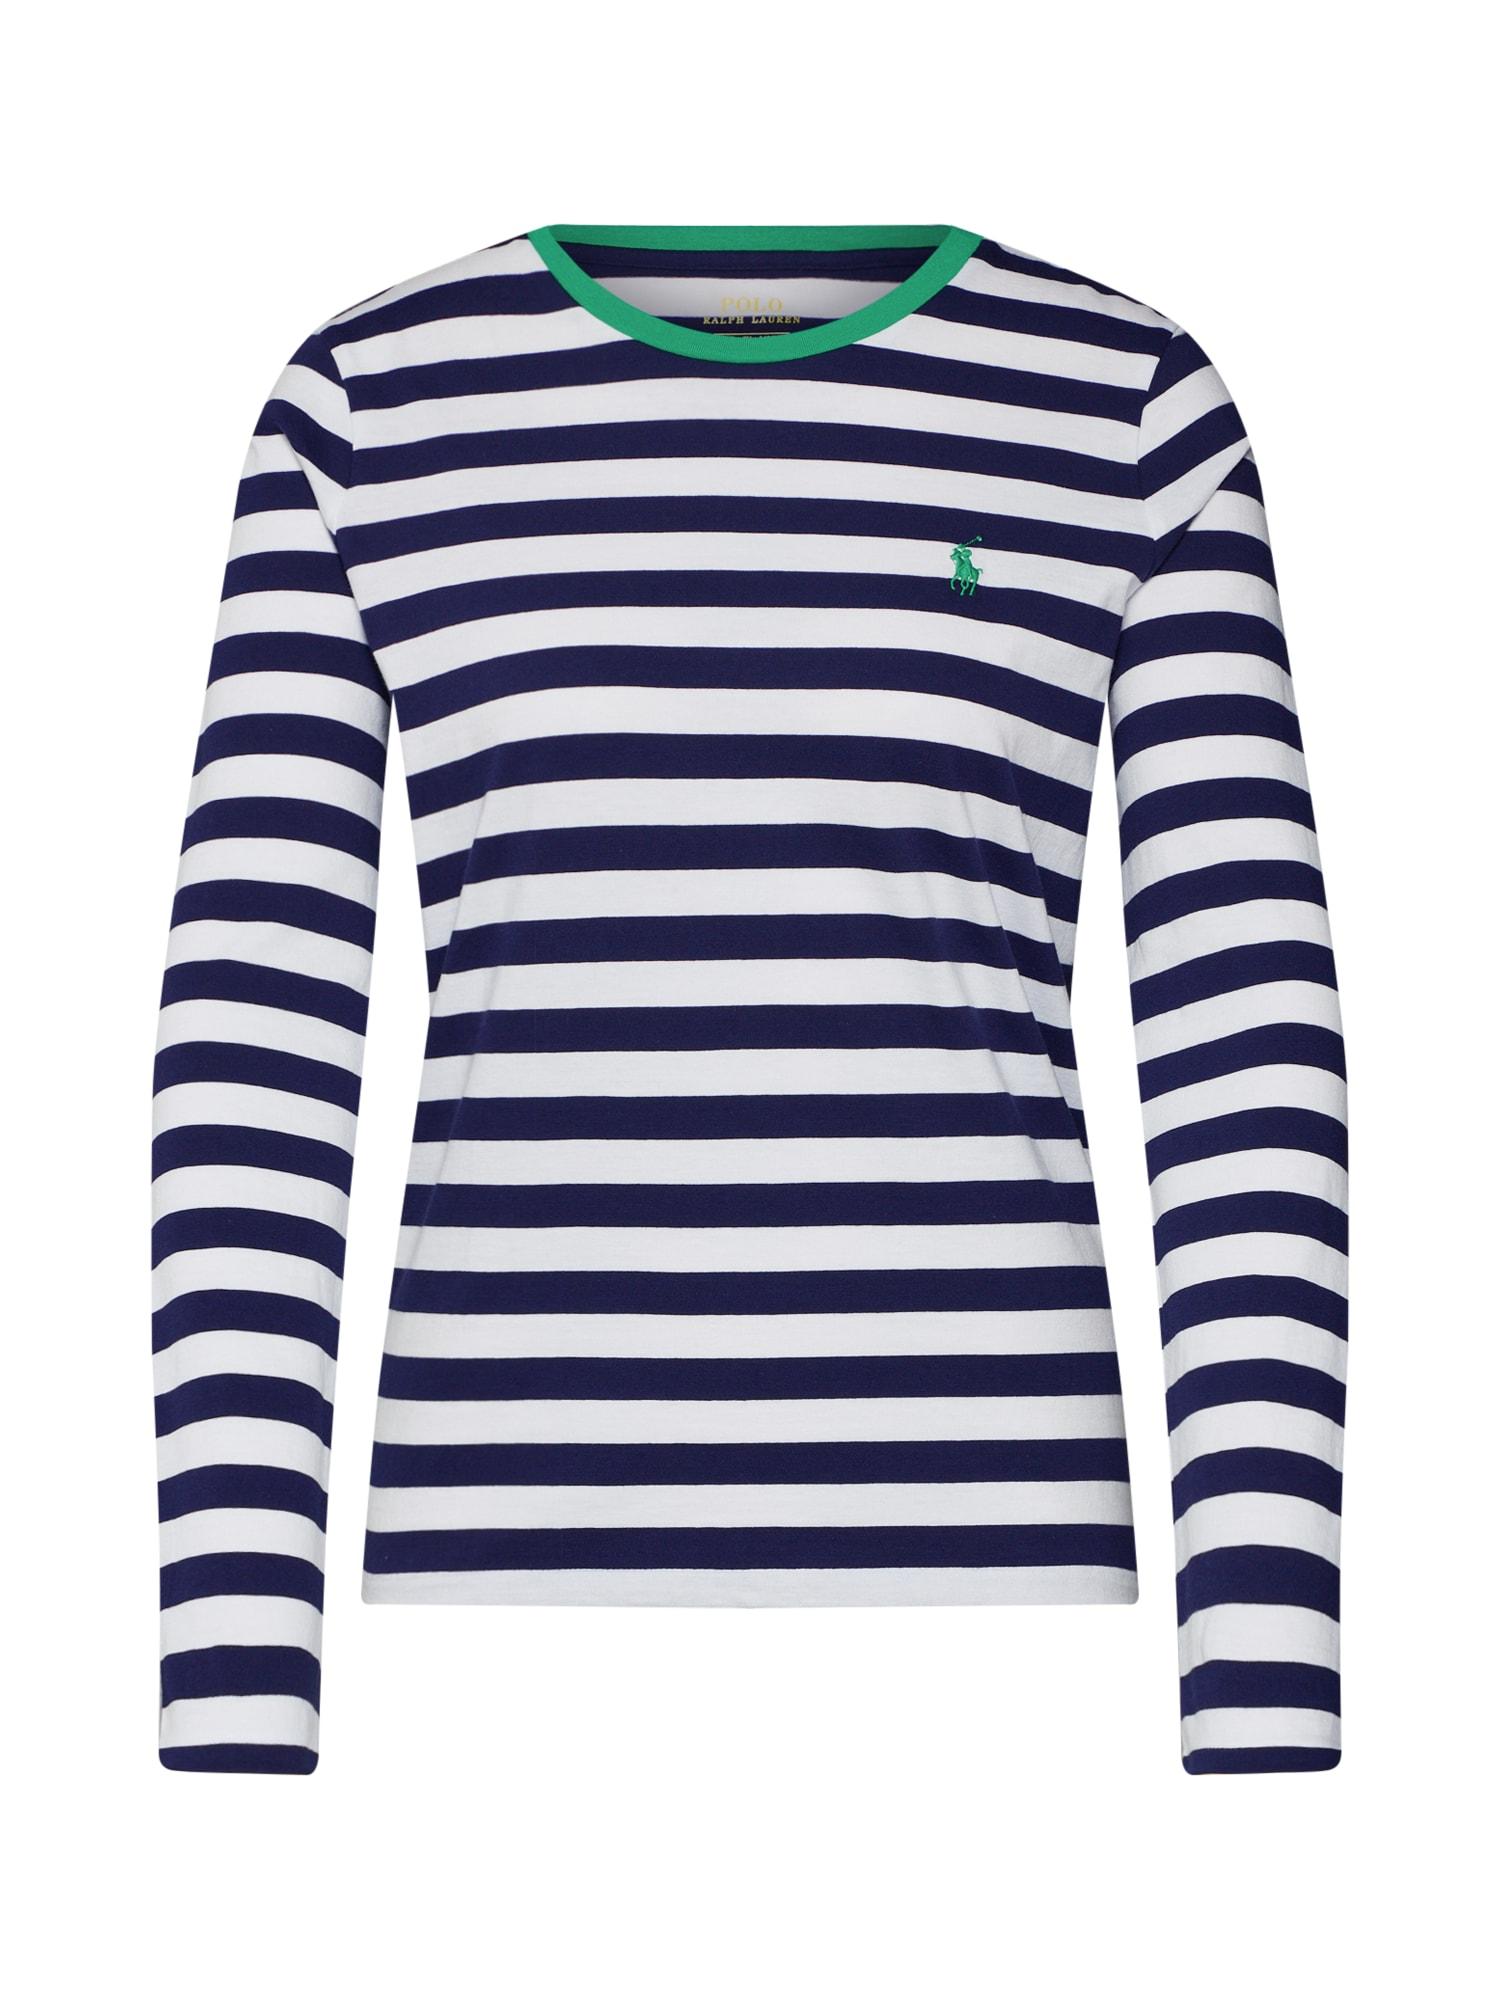 Tričko LS T W PP-LONG SLEEVE-KNIT námořnická modř bílá POLO RALPH LAUREN